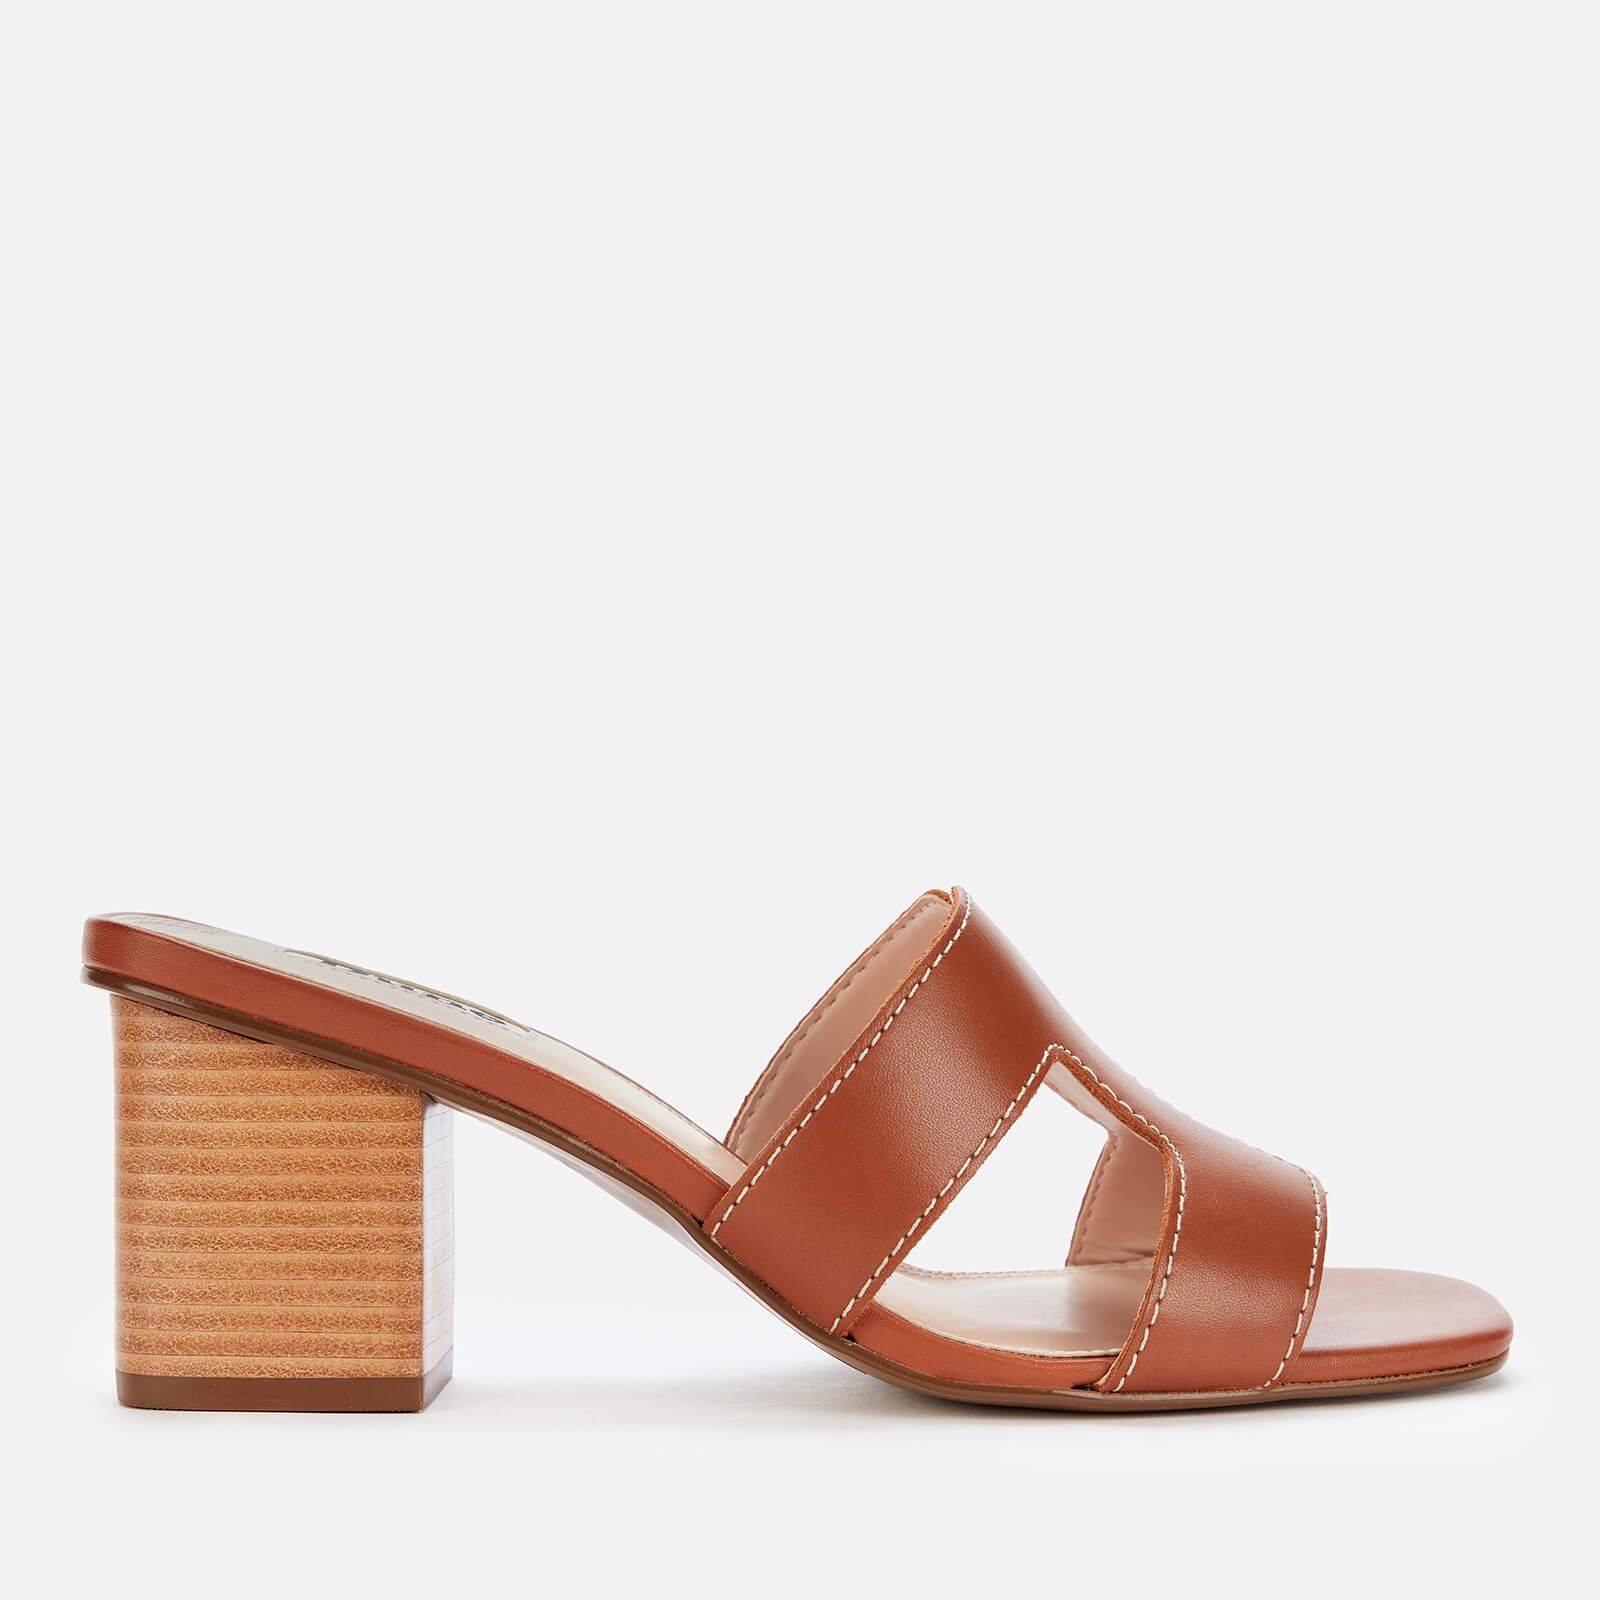 Dune Womens Jupe Leather Heeled Mules Tan Uk 8